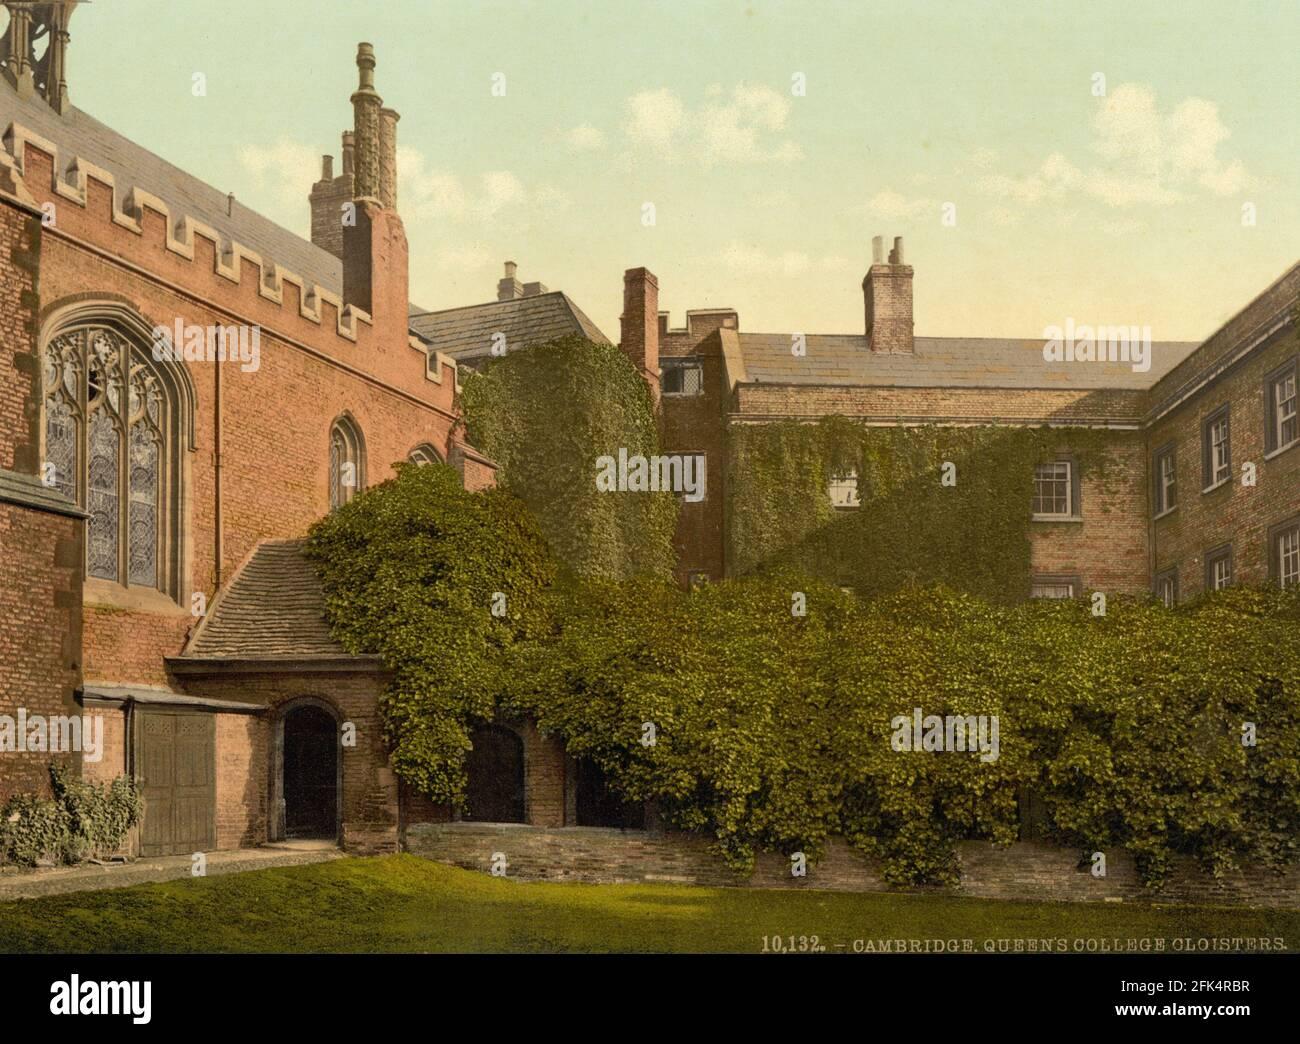 Queen's College Cloisters, Cambridge University, Cambridge circa 1890-1900 Stock Photo